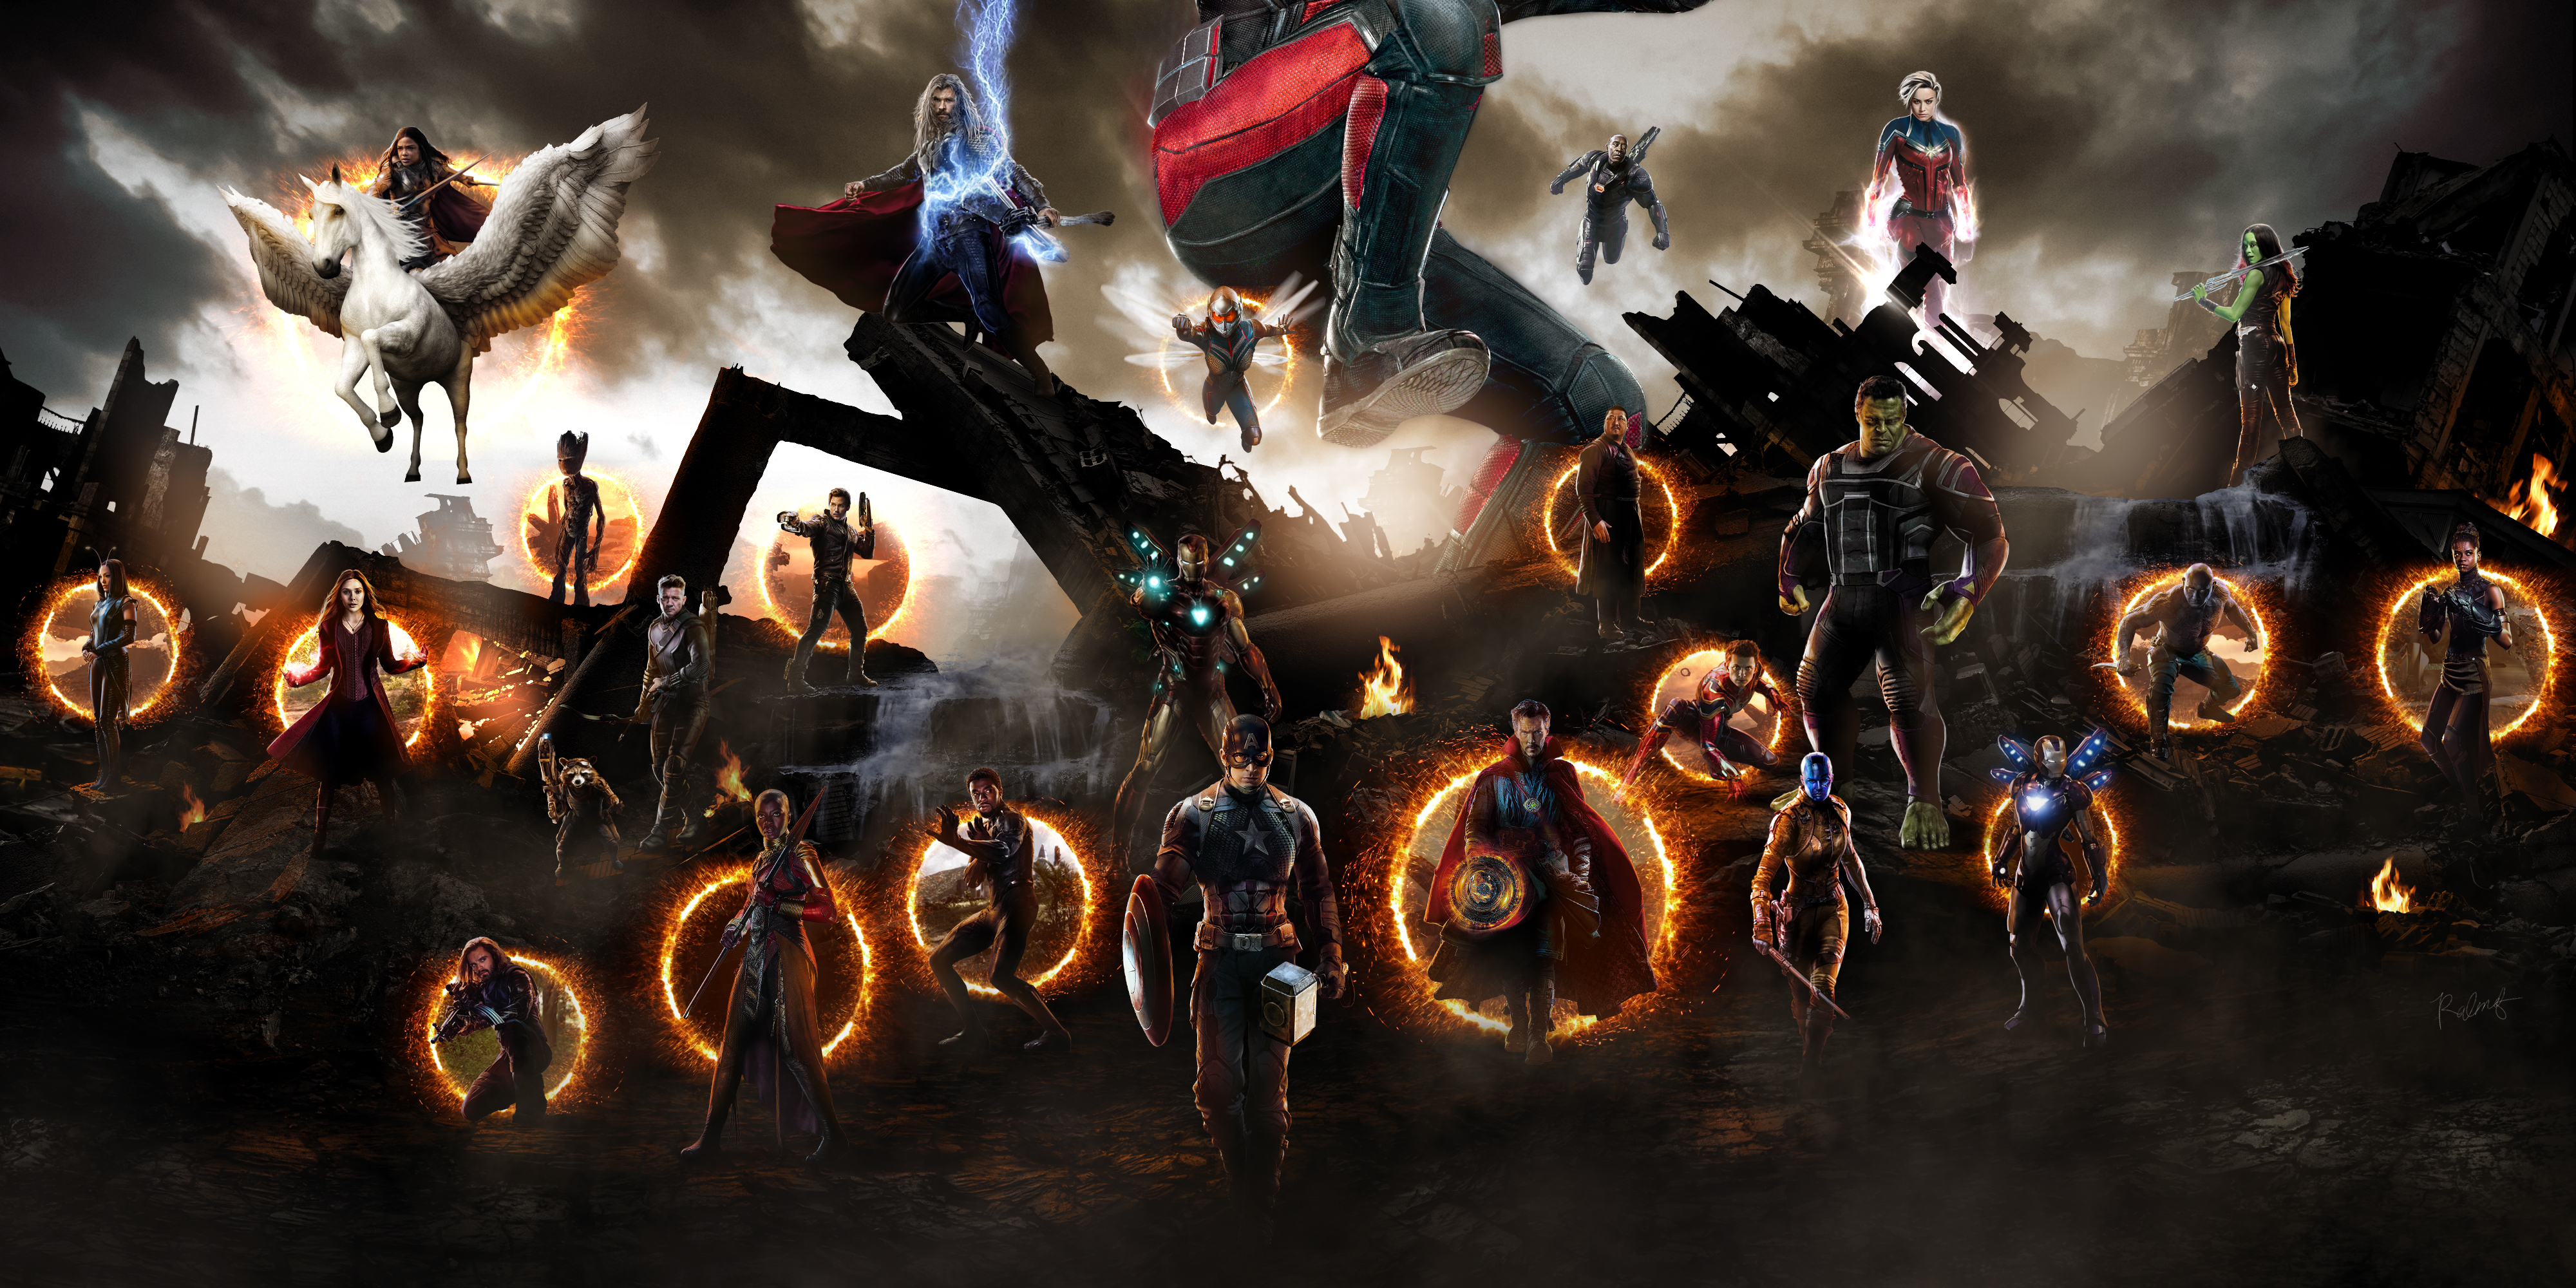 480x800 Avengers Endgame Final Battle Scene Galaxy Note,HTC